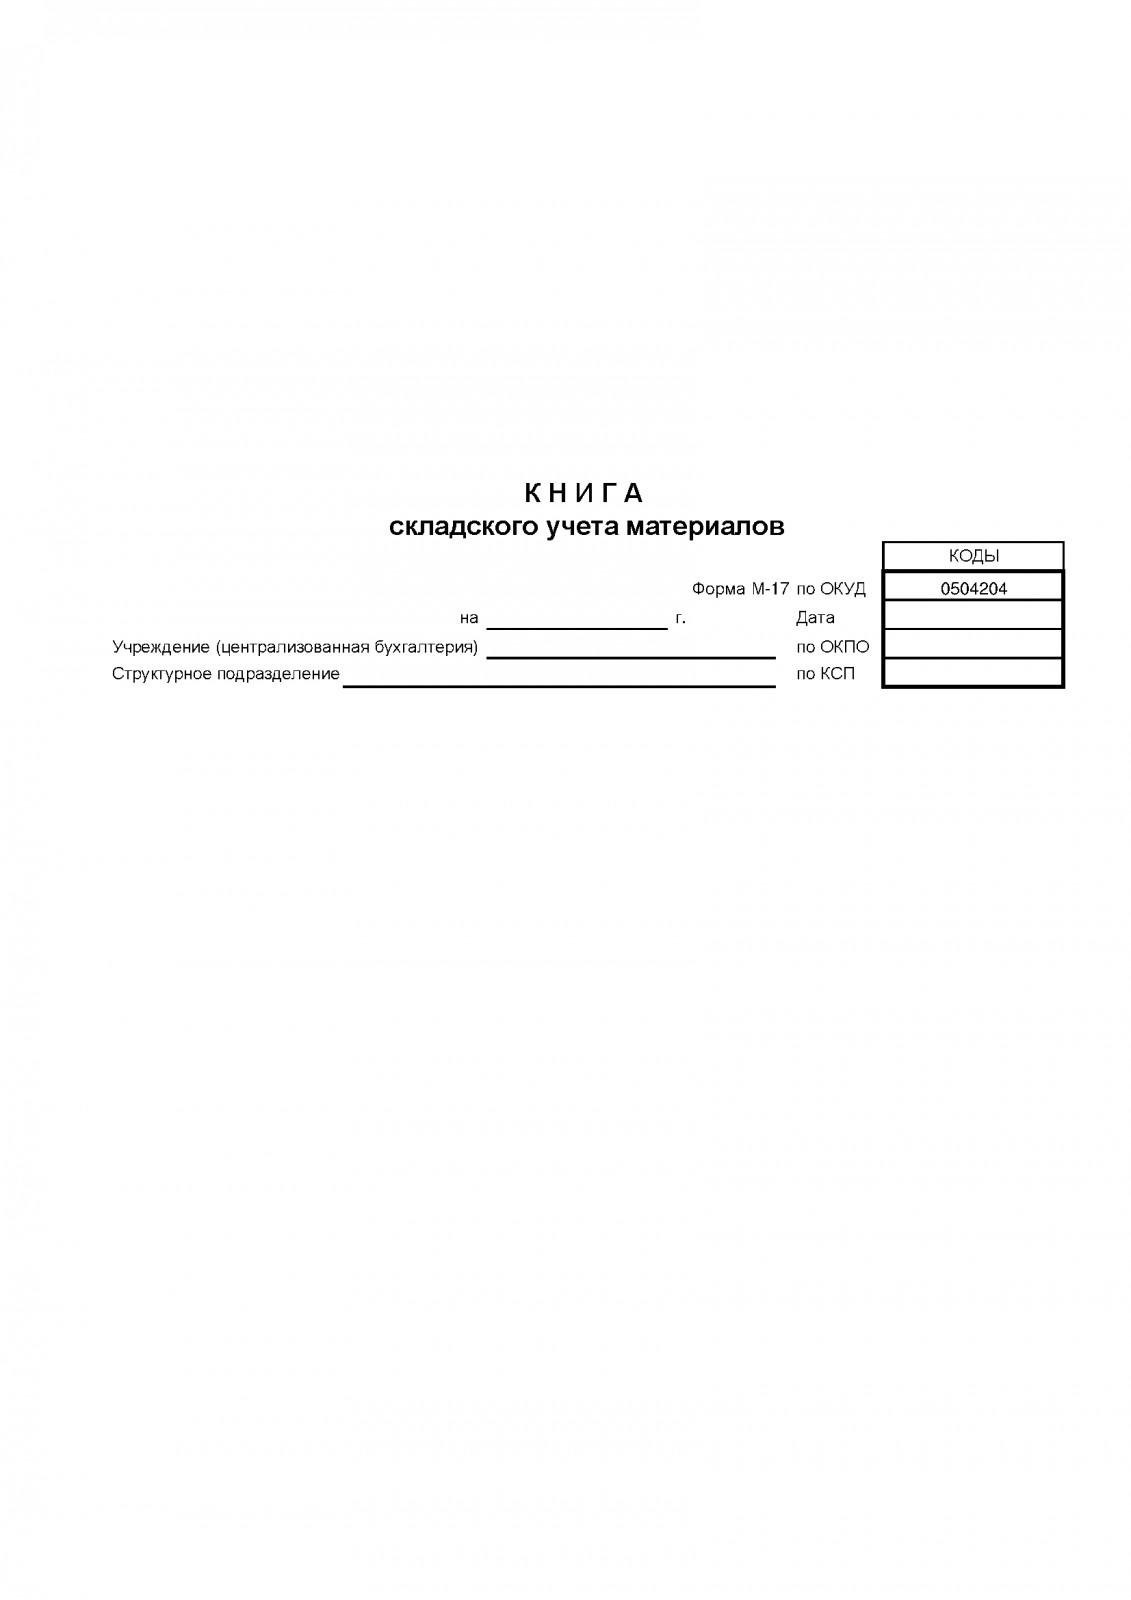 Книга складского учета форма м-17 бланк